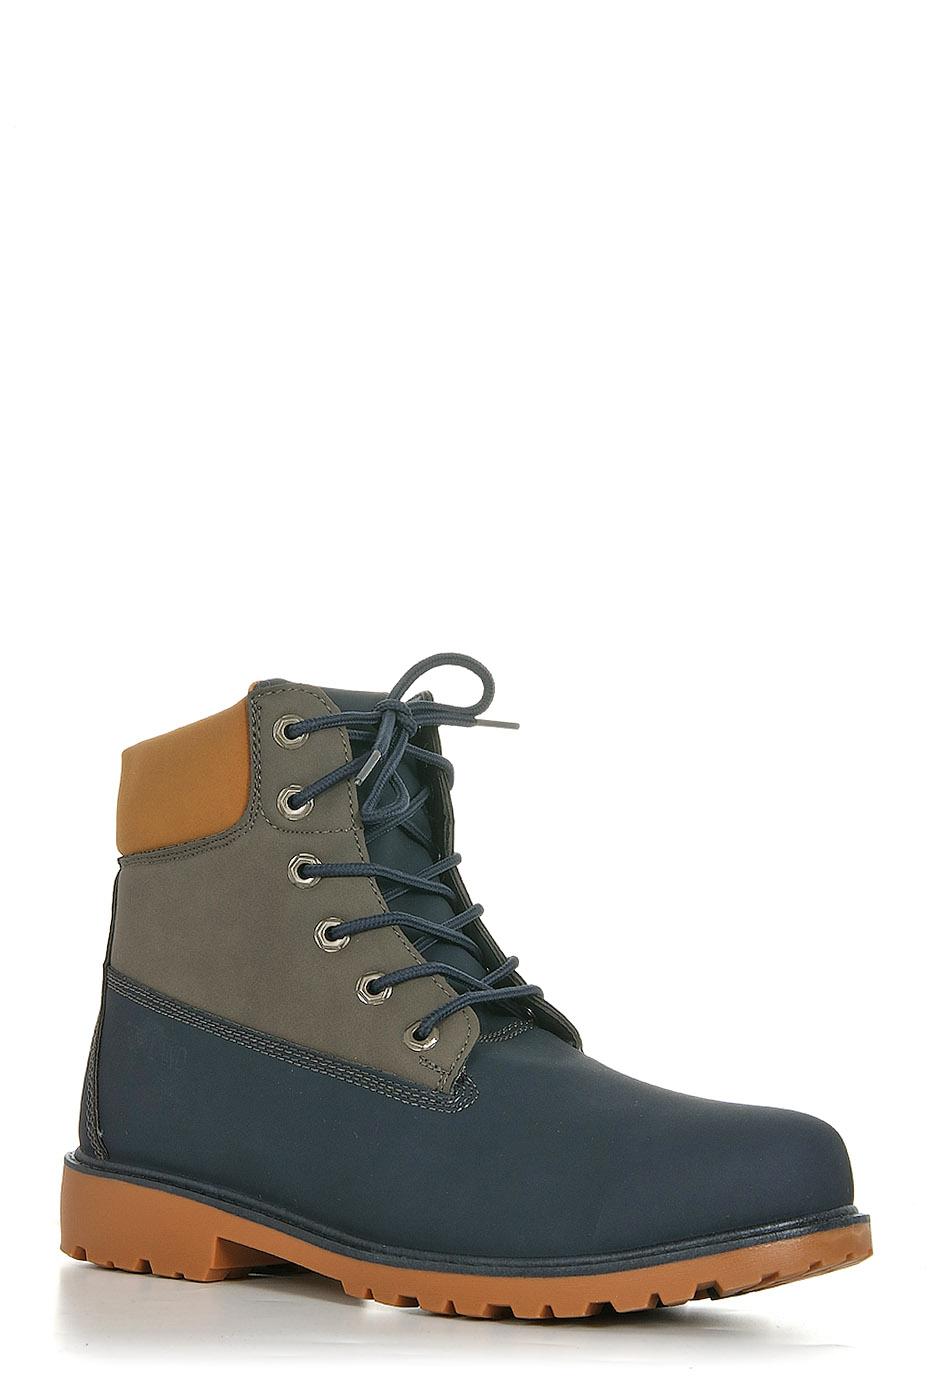 Ботинки TOPLAND1323-PB76180T/NAVY